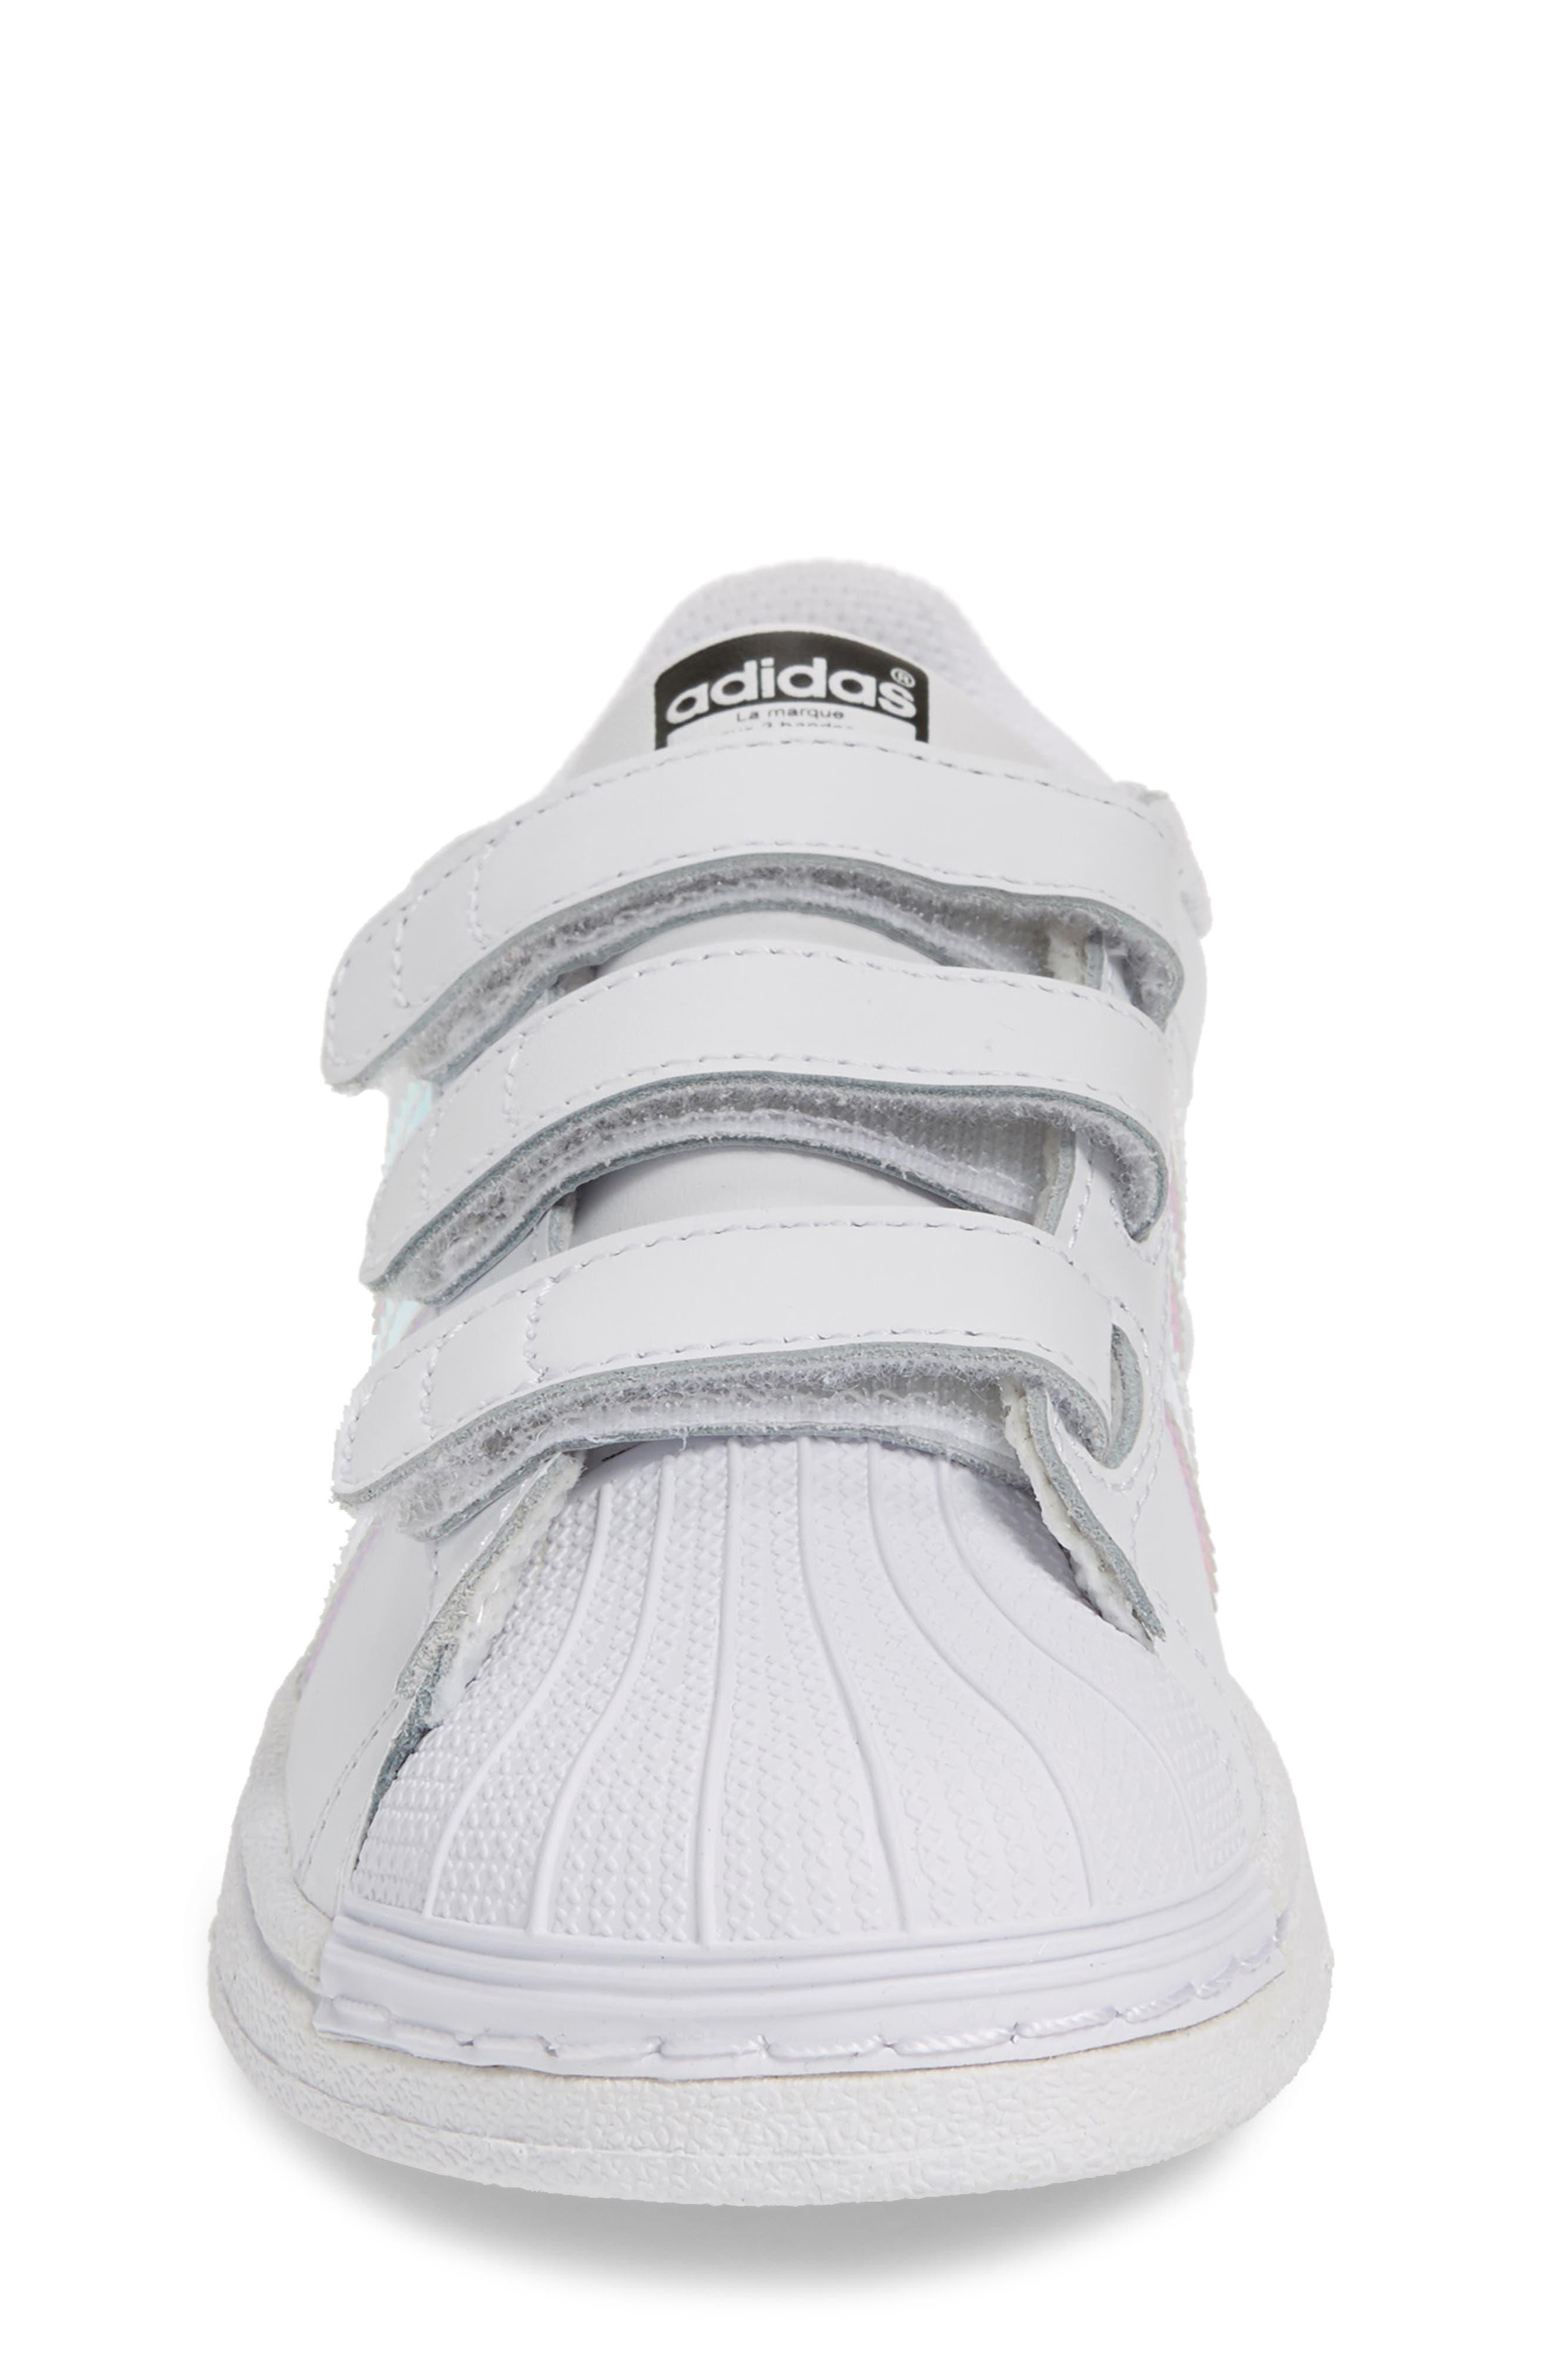 Superstar - Iridescent Sneaker,                             Alternate thumbnail 4, color,                             100